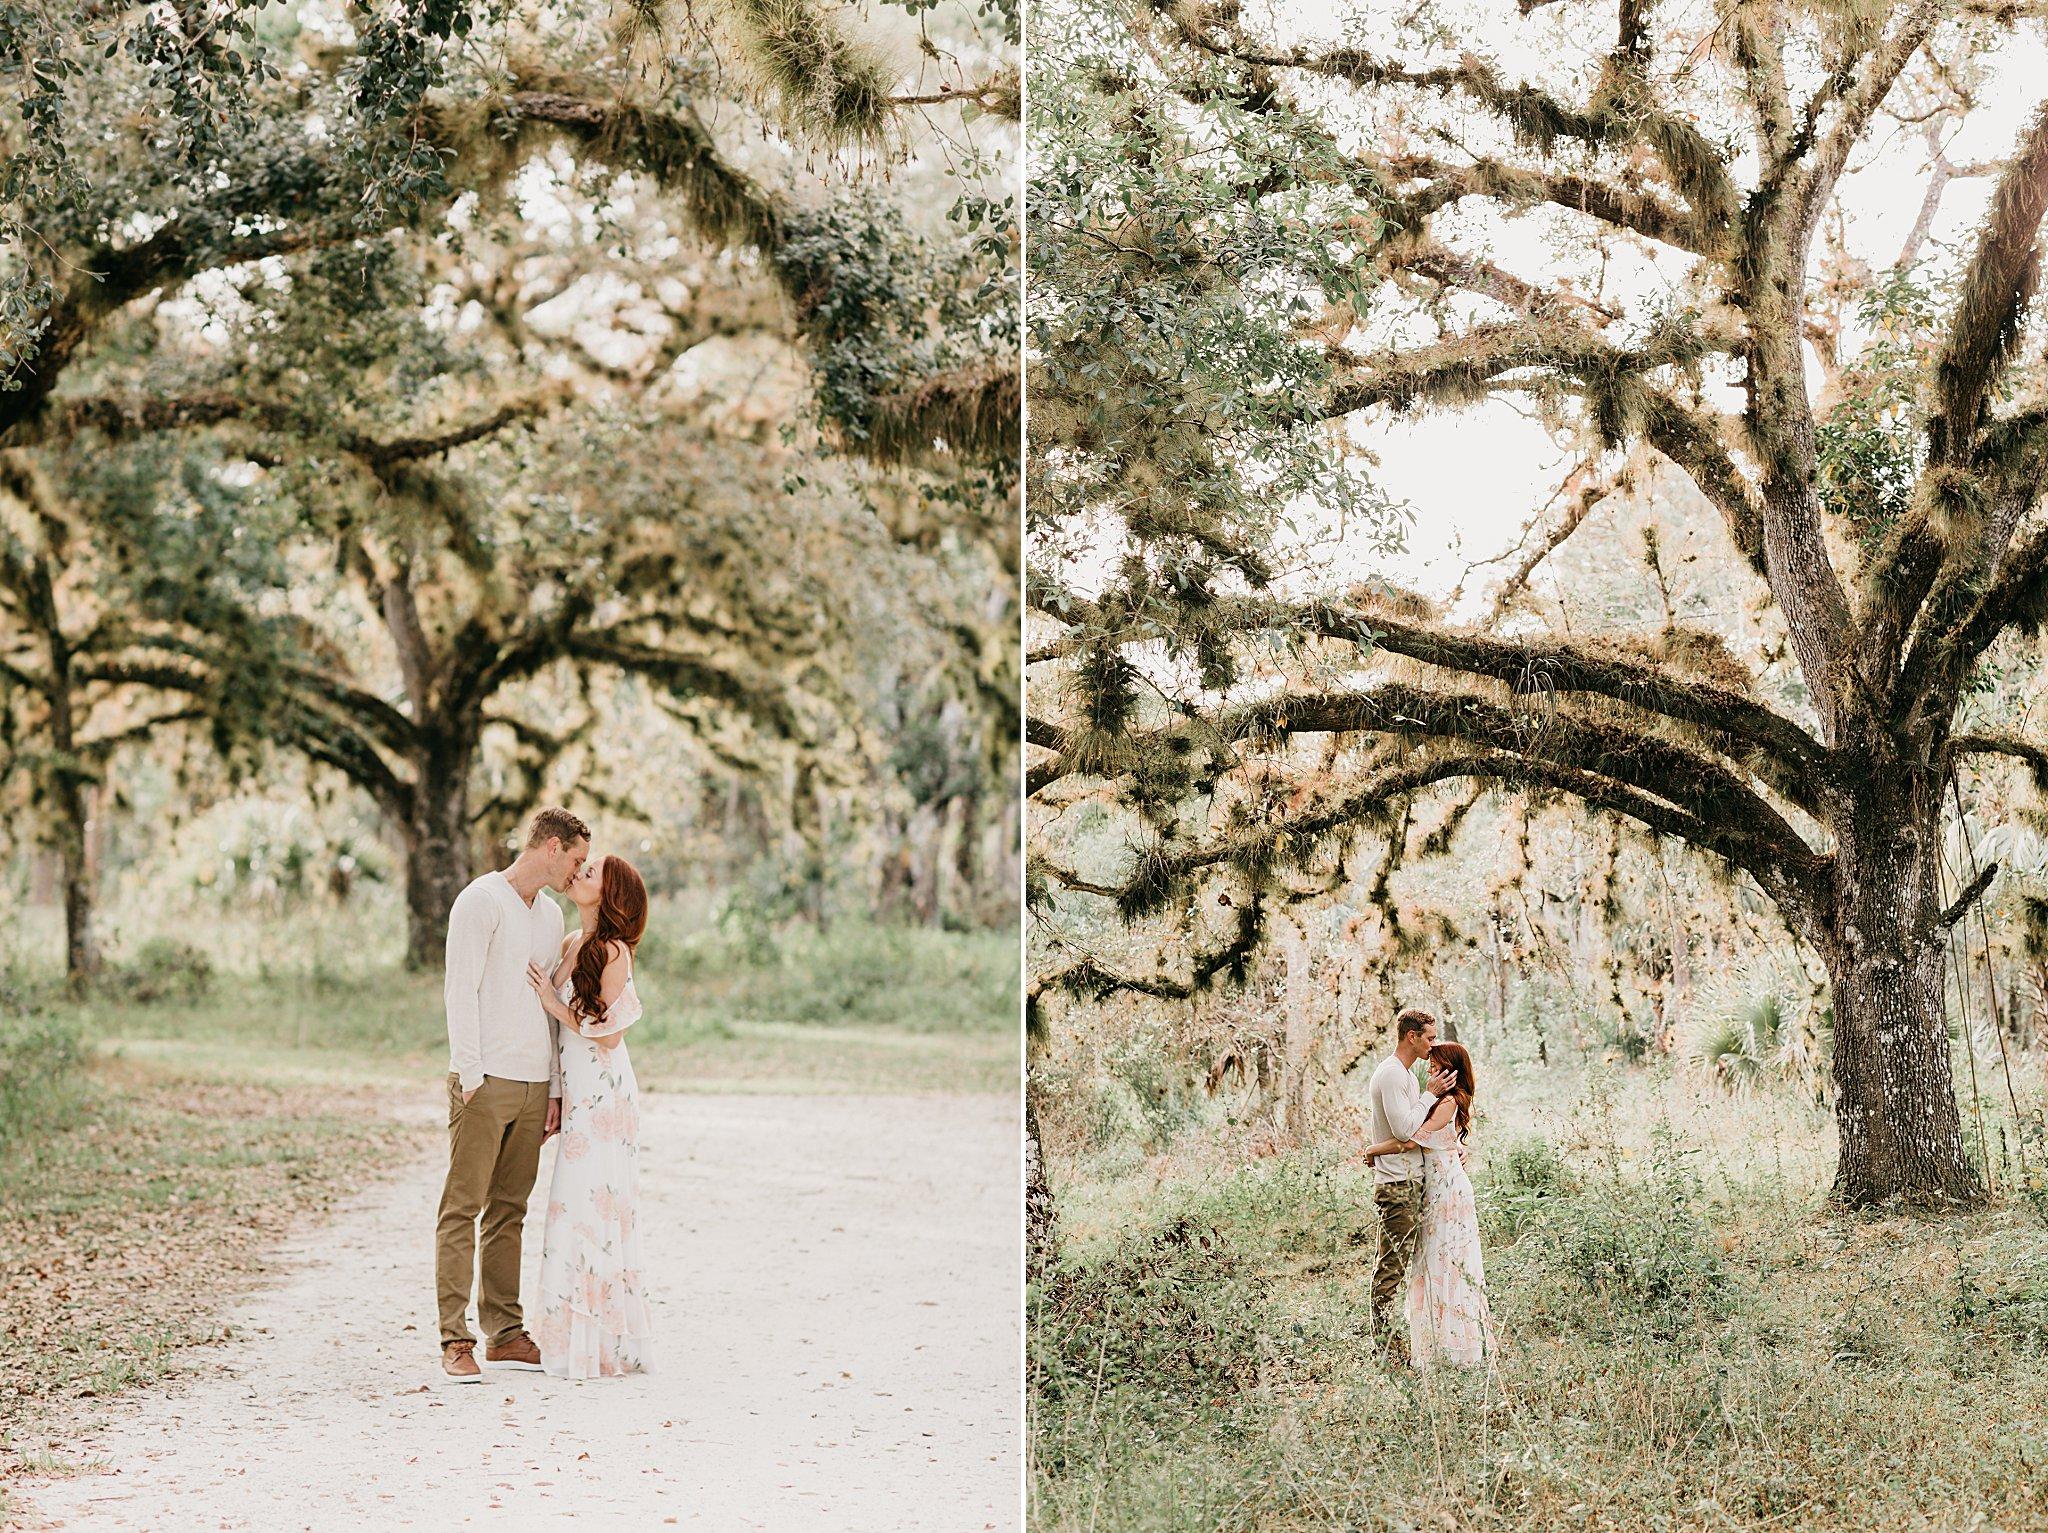 JessicaBordnerPhotography_4449.jpg